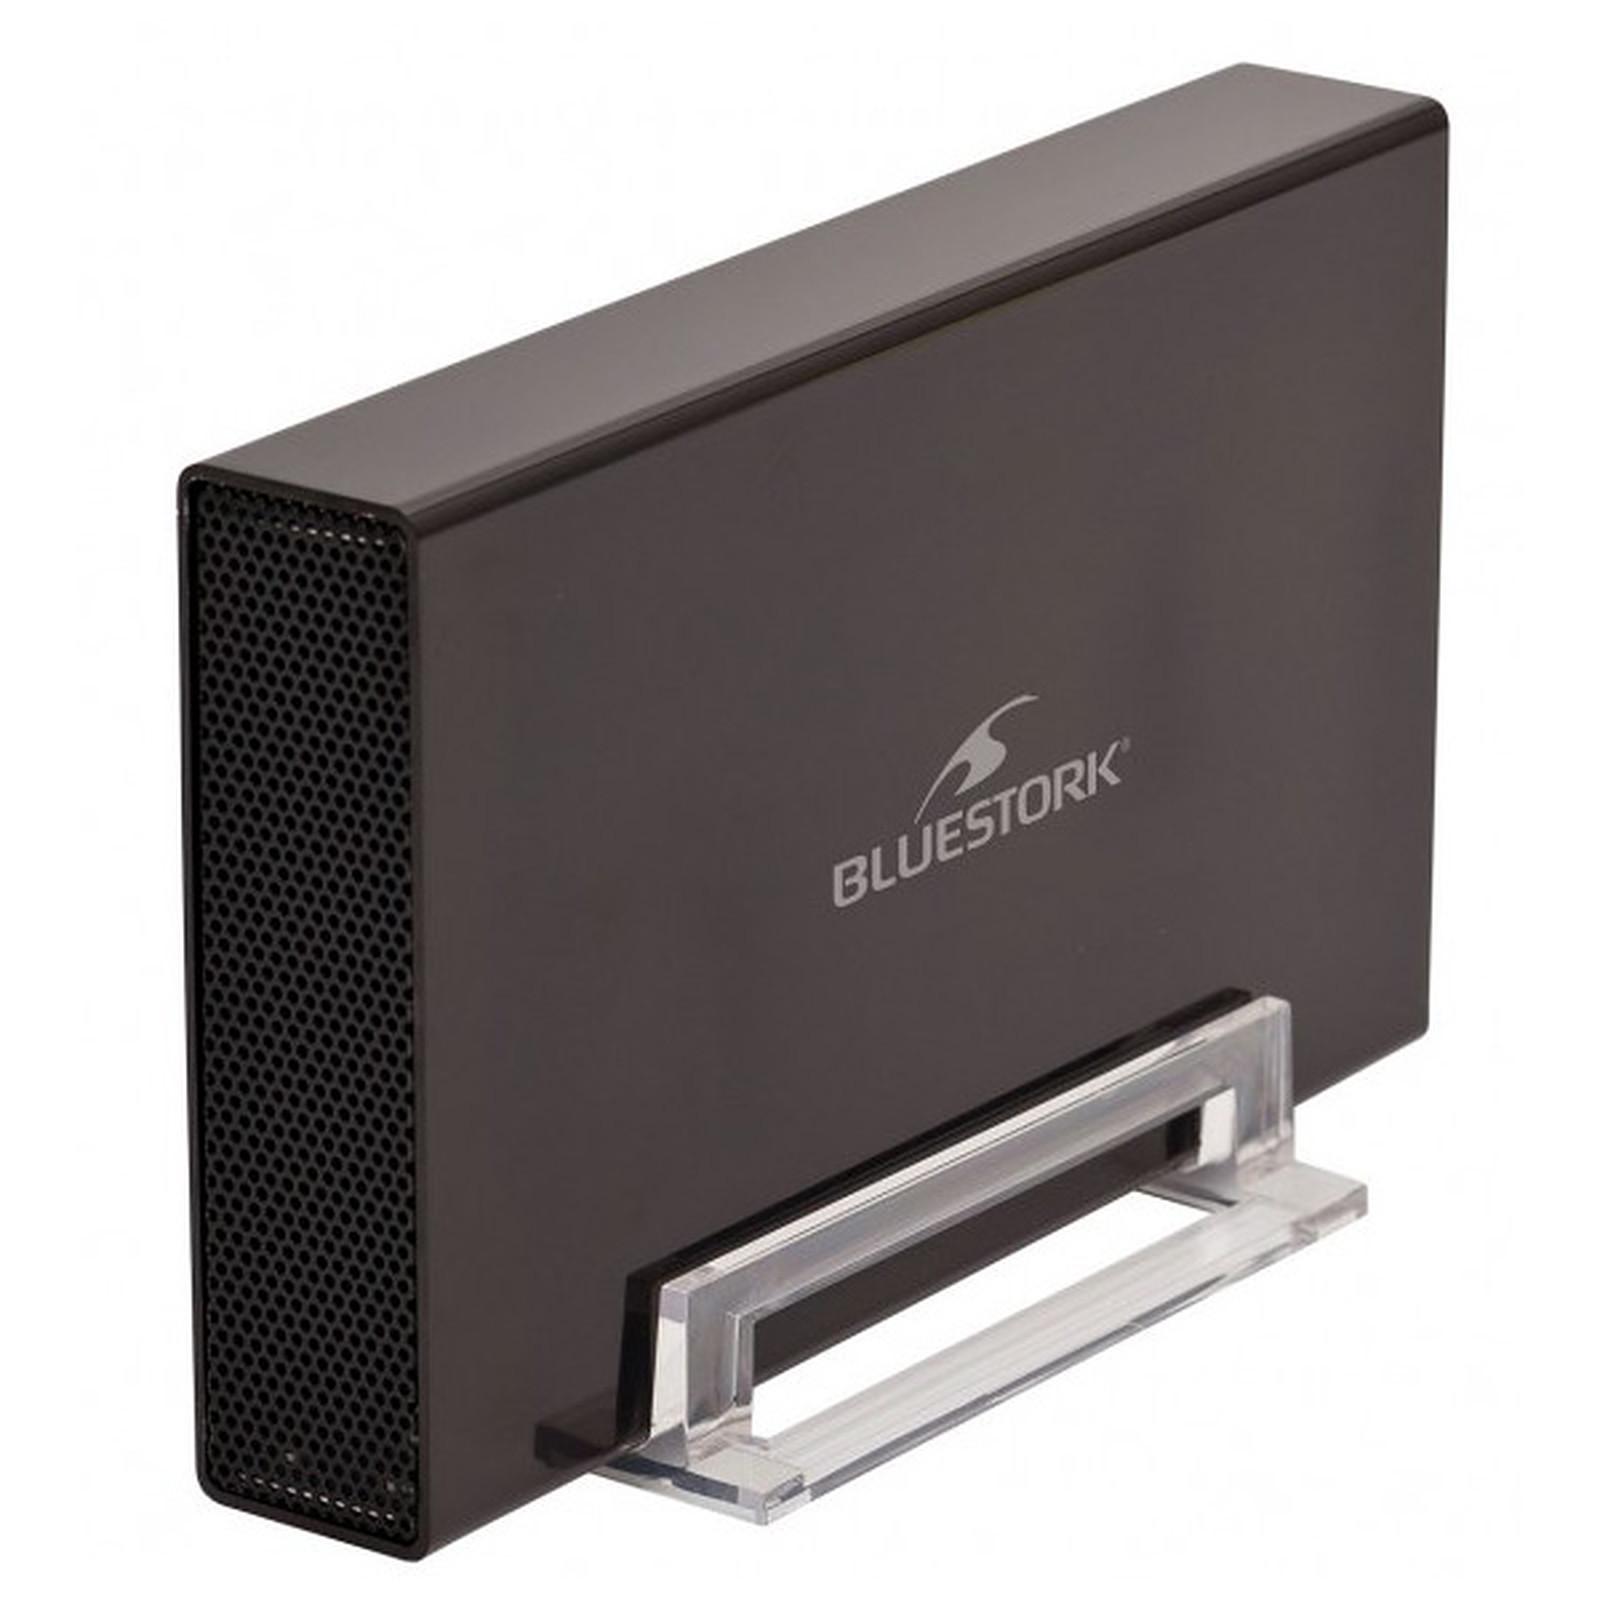 Bluestork BS-EHD-35/COMBO/30